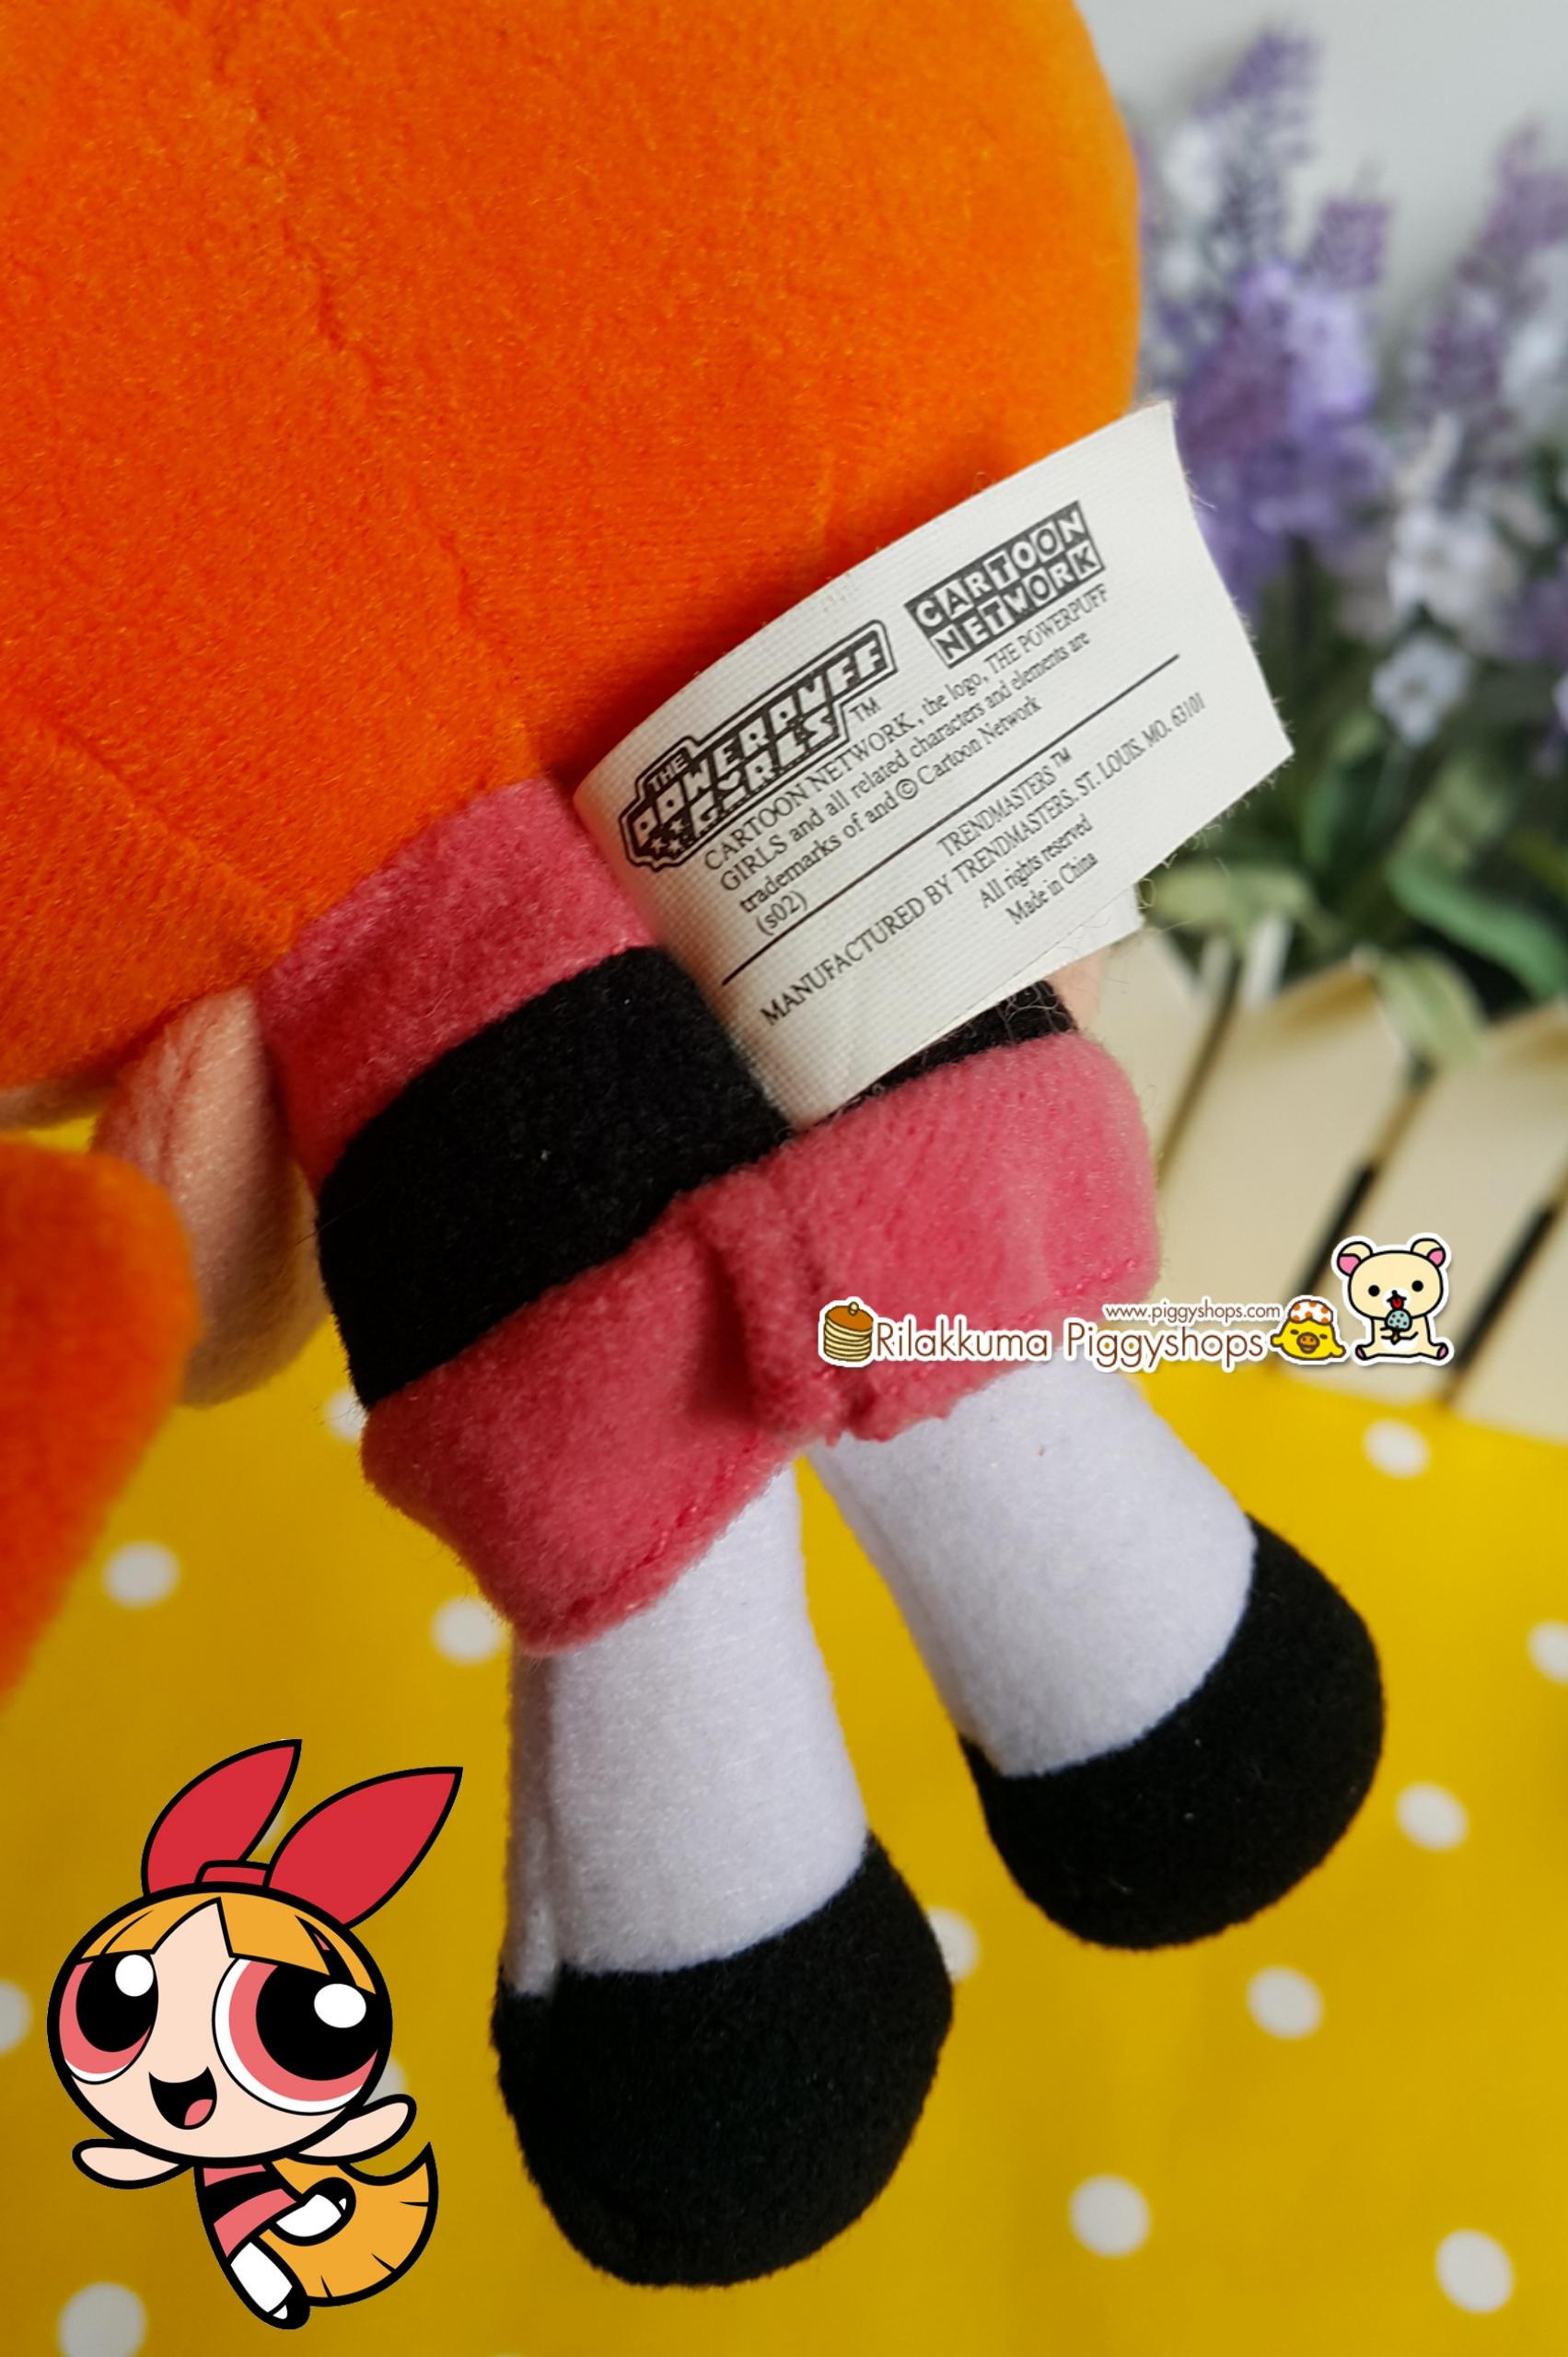 Powerpuff Girls - Blossom plush doll บลอซซั่มสาวน้อยพาวเวอร์พัฟเกริ์ลชุดส้ม